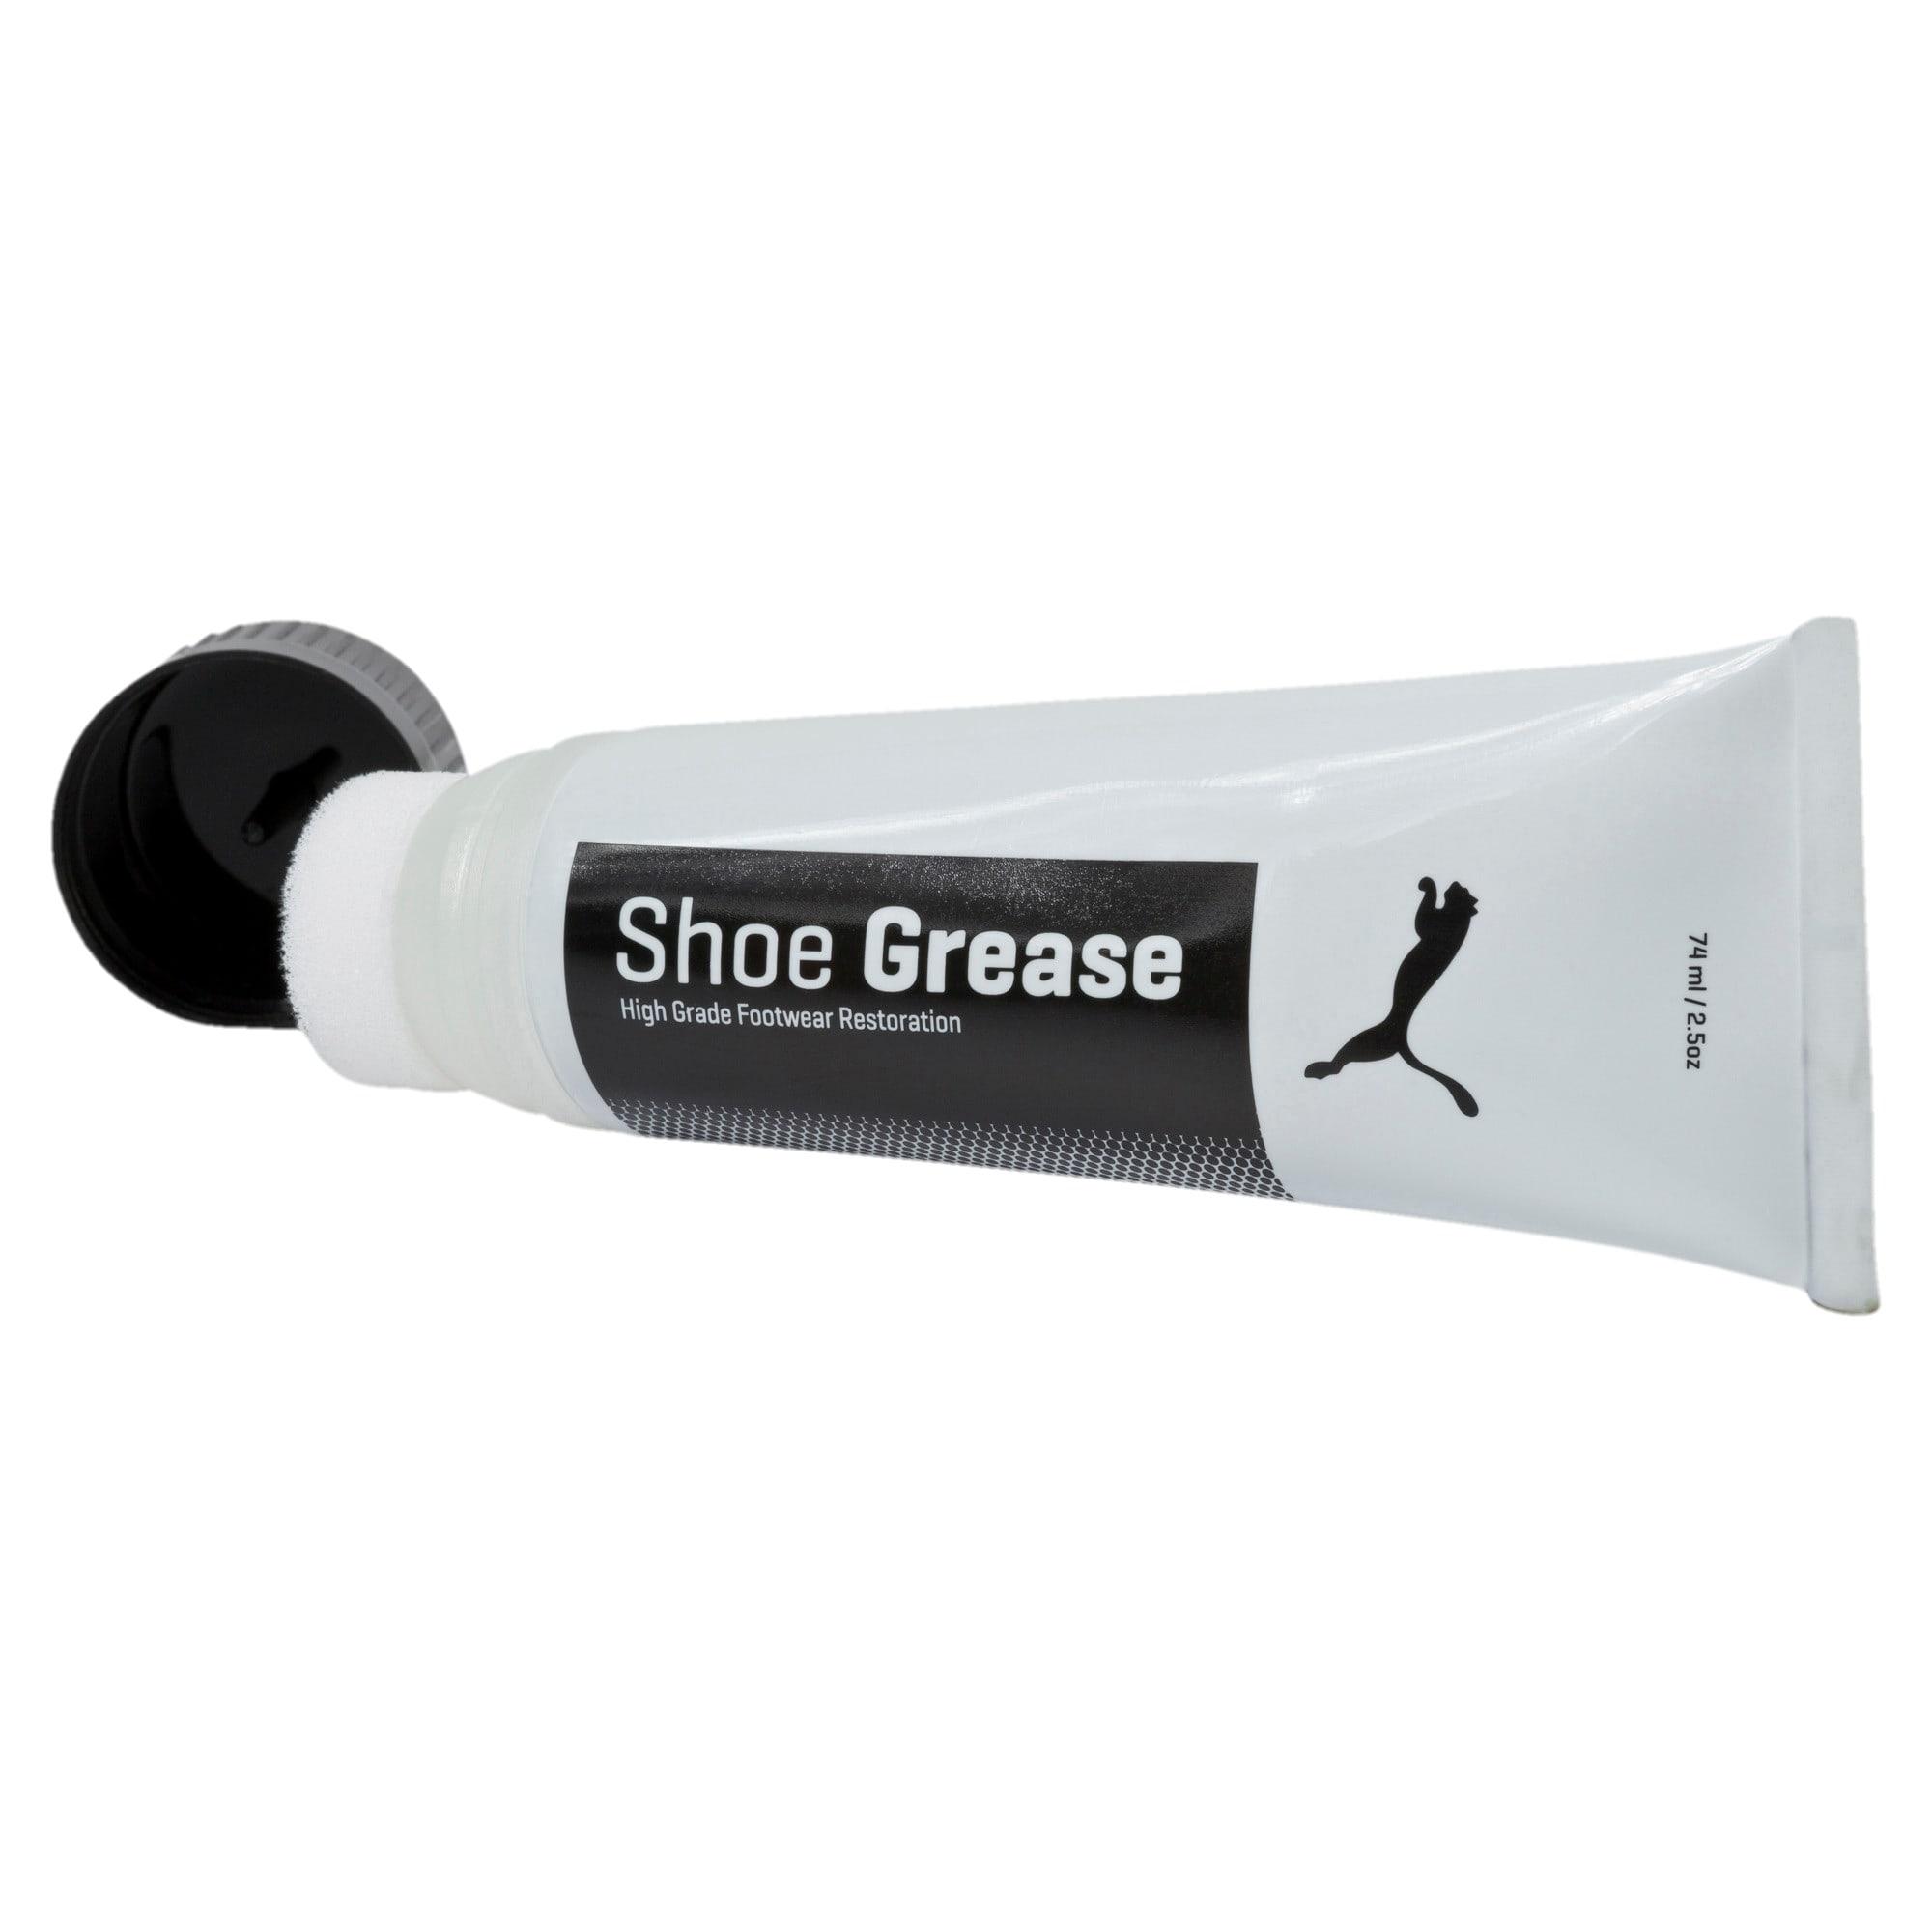 Thumbnail 1 of Shoe Grease, white-black, medium-IND